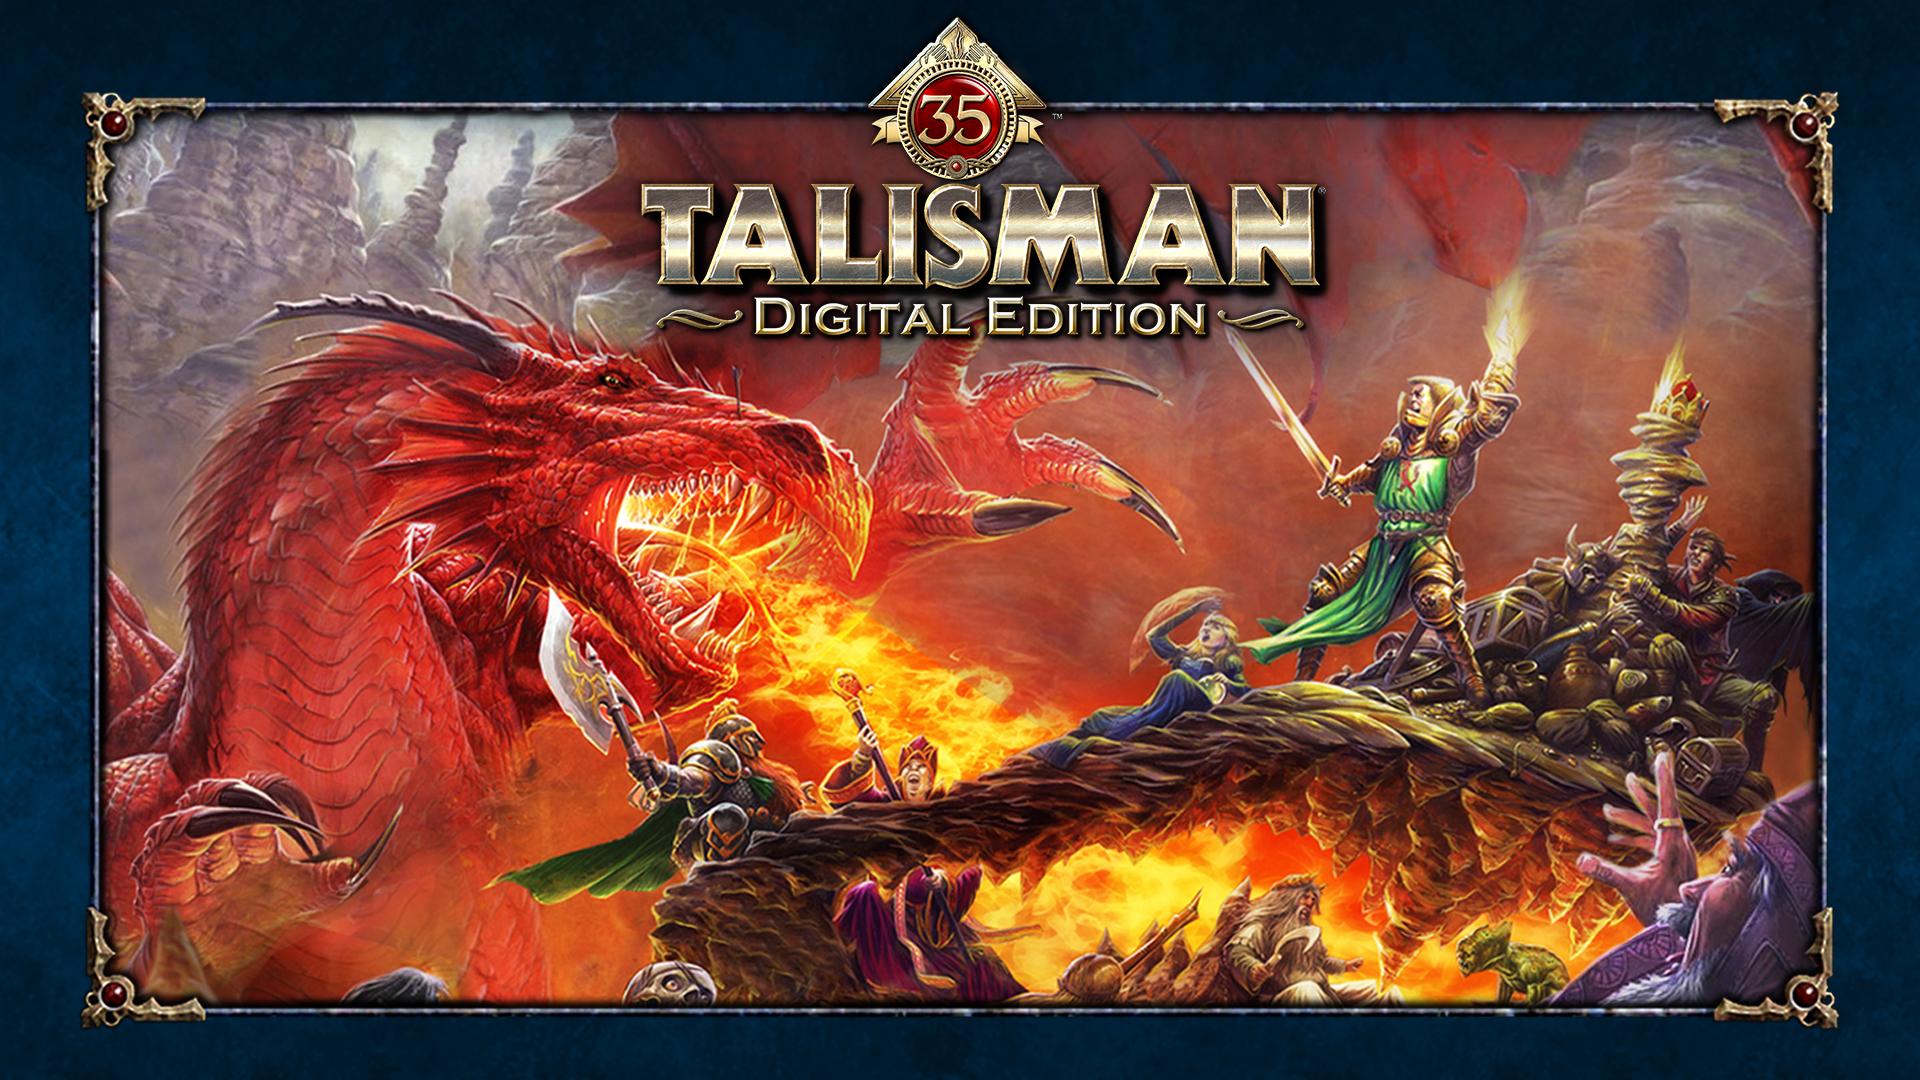 Talisman-Wallpaper-16by9.jpg